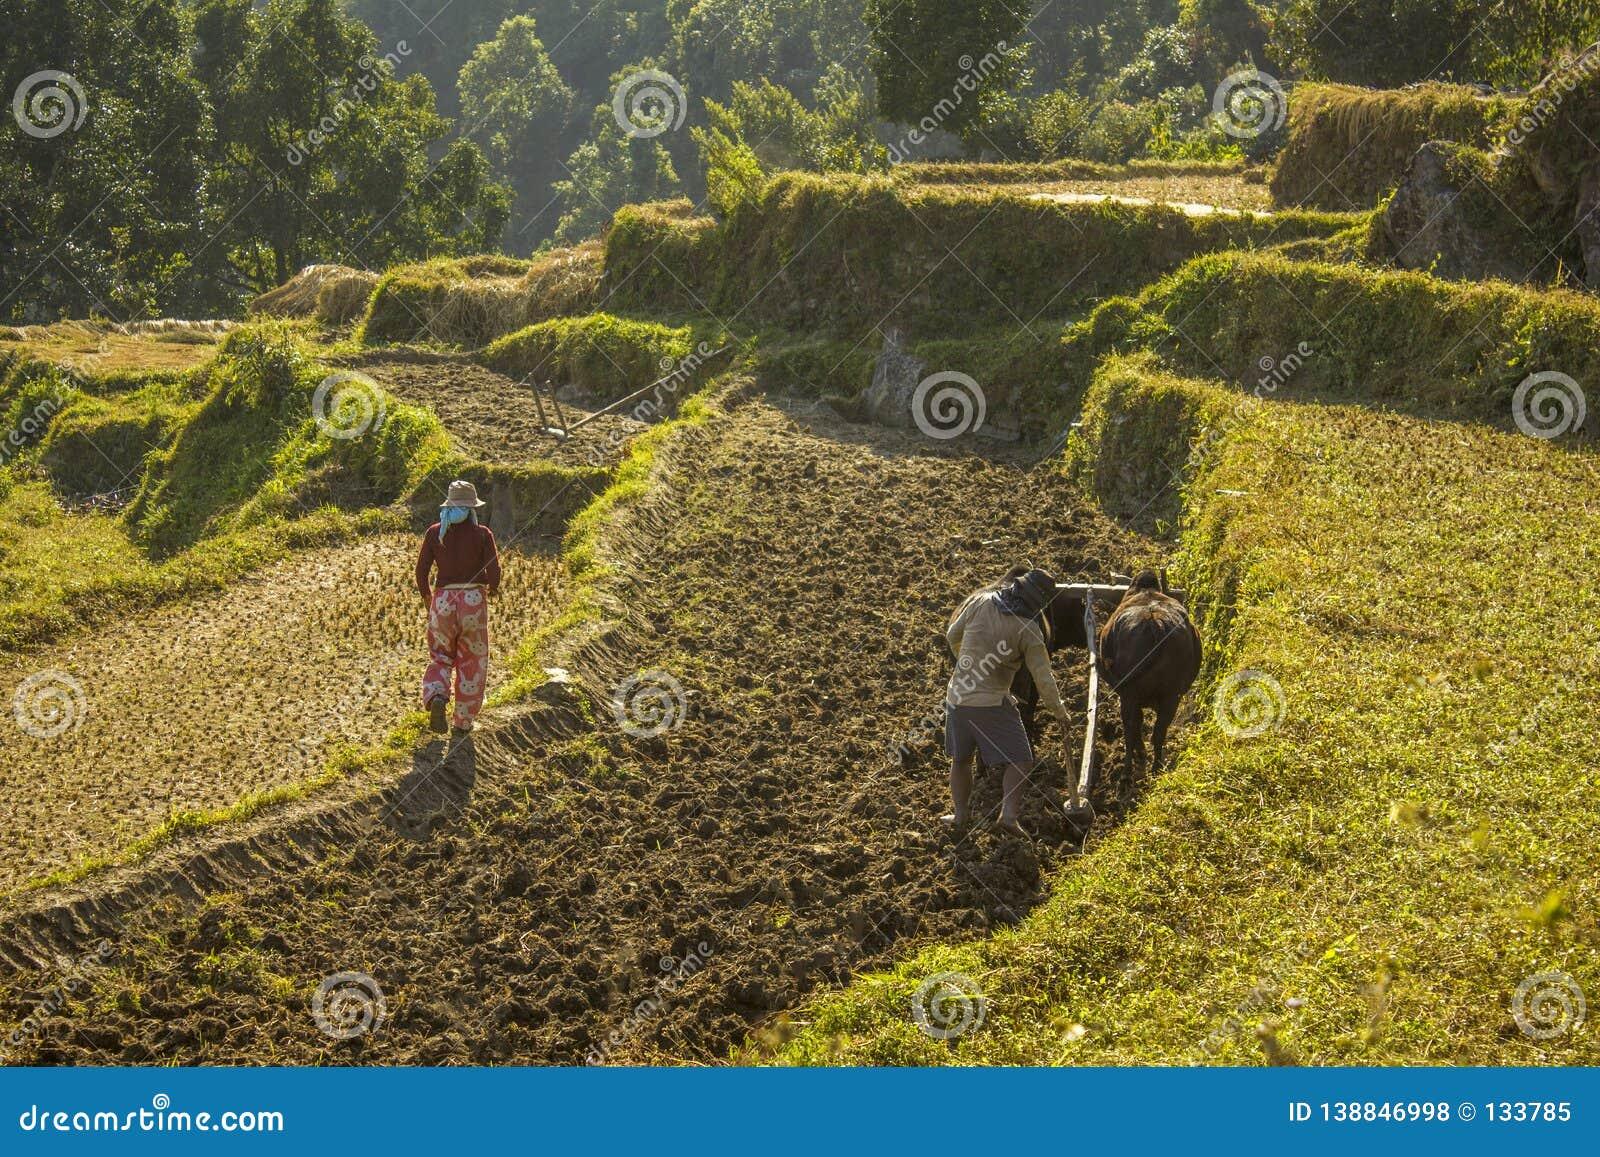 Asian farmer plows rice field with buffaloes